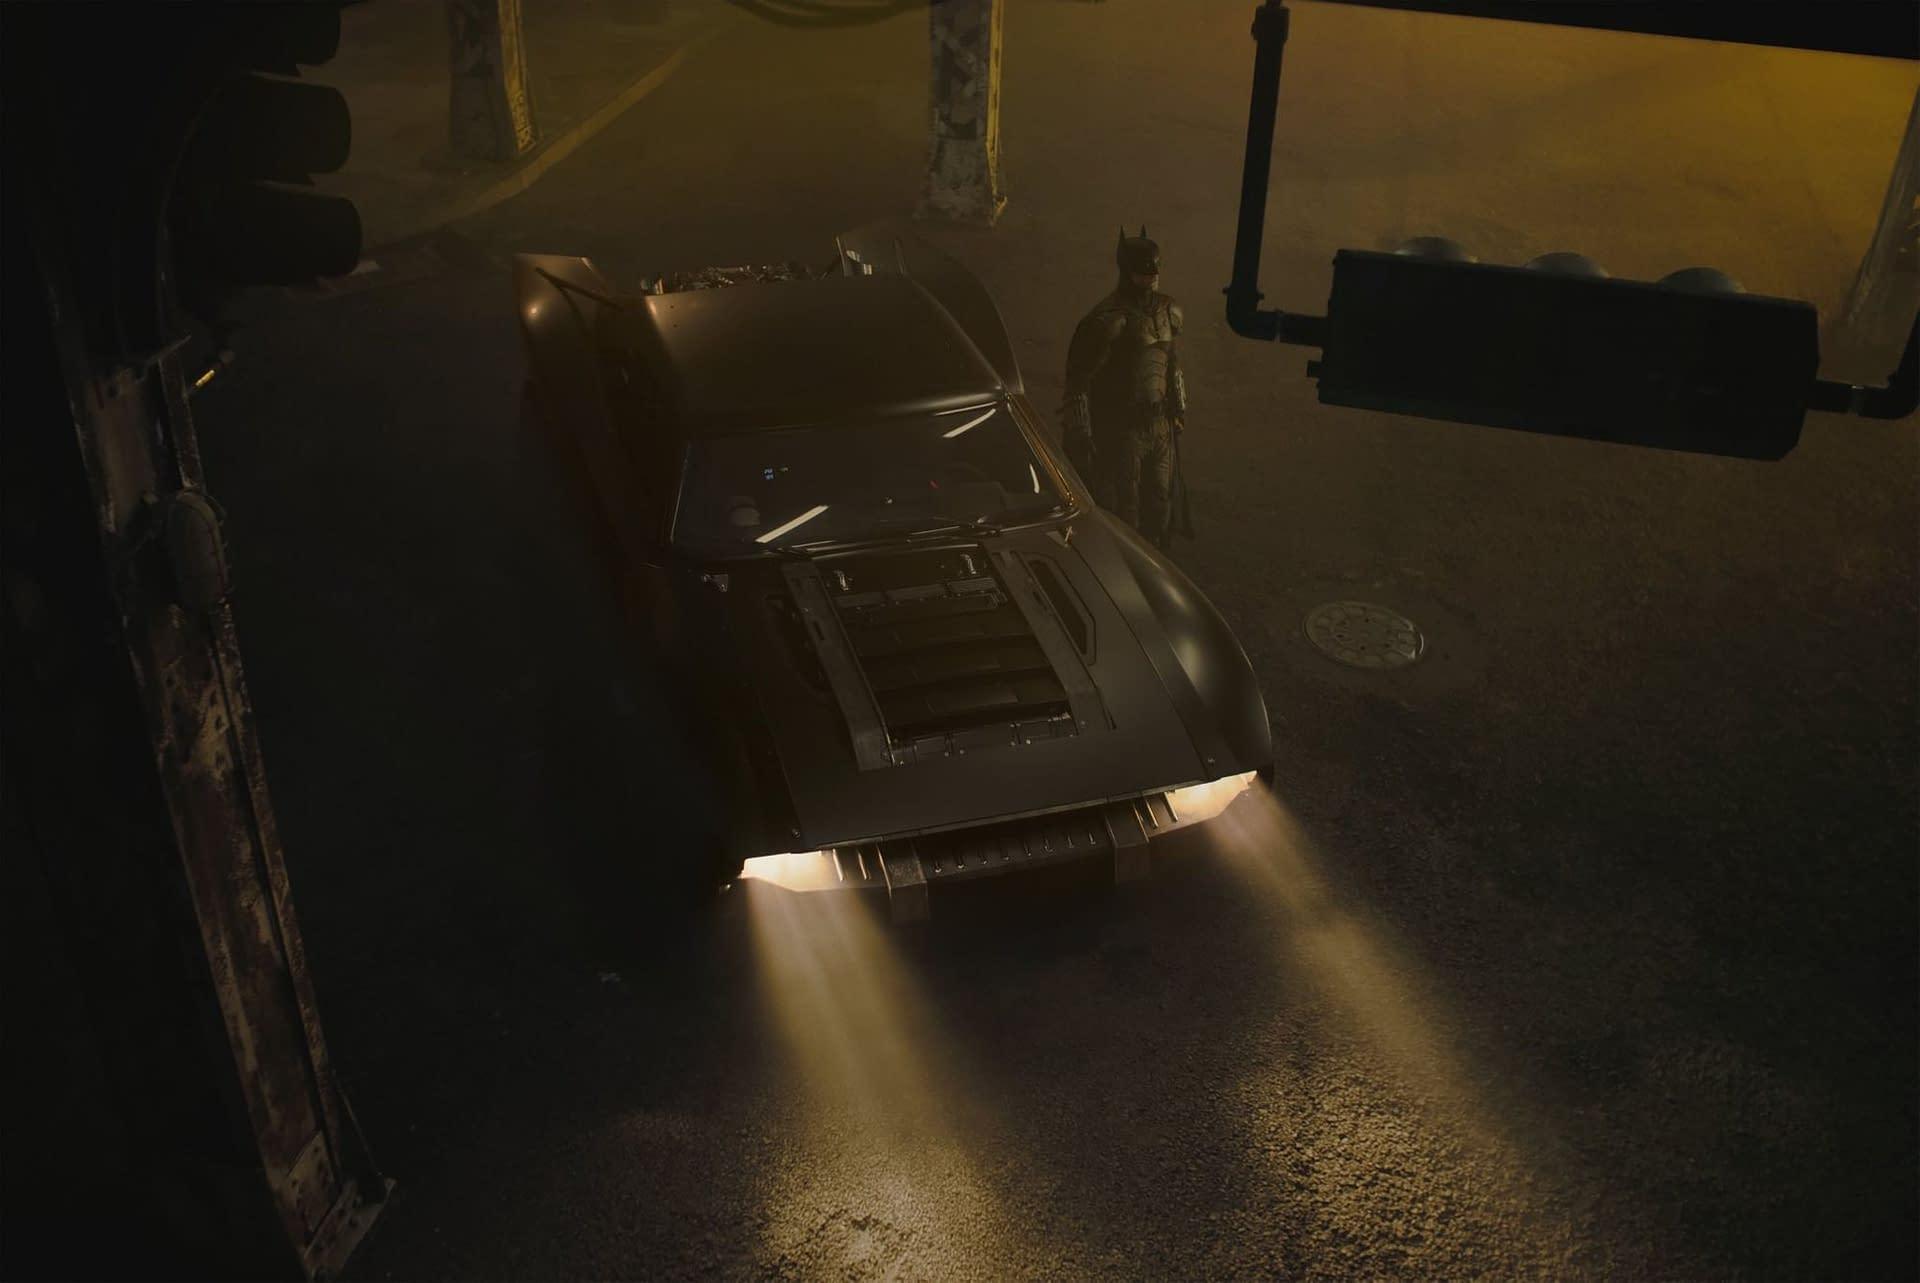 """The Batman"" Director Matt Reeves Shares 3 New Images of the Batmobile"